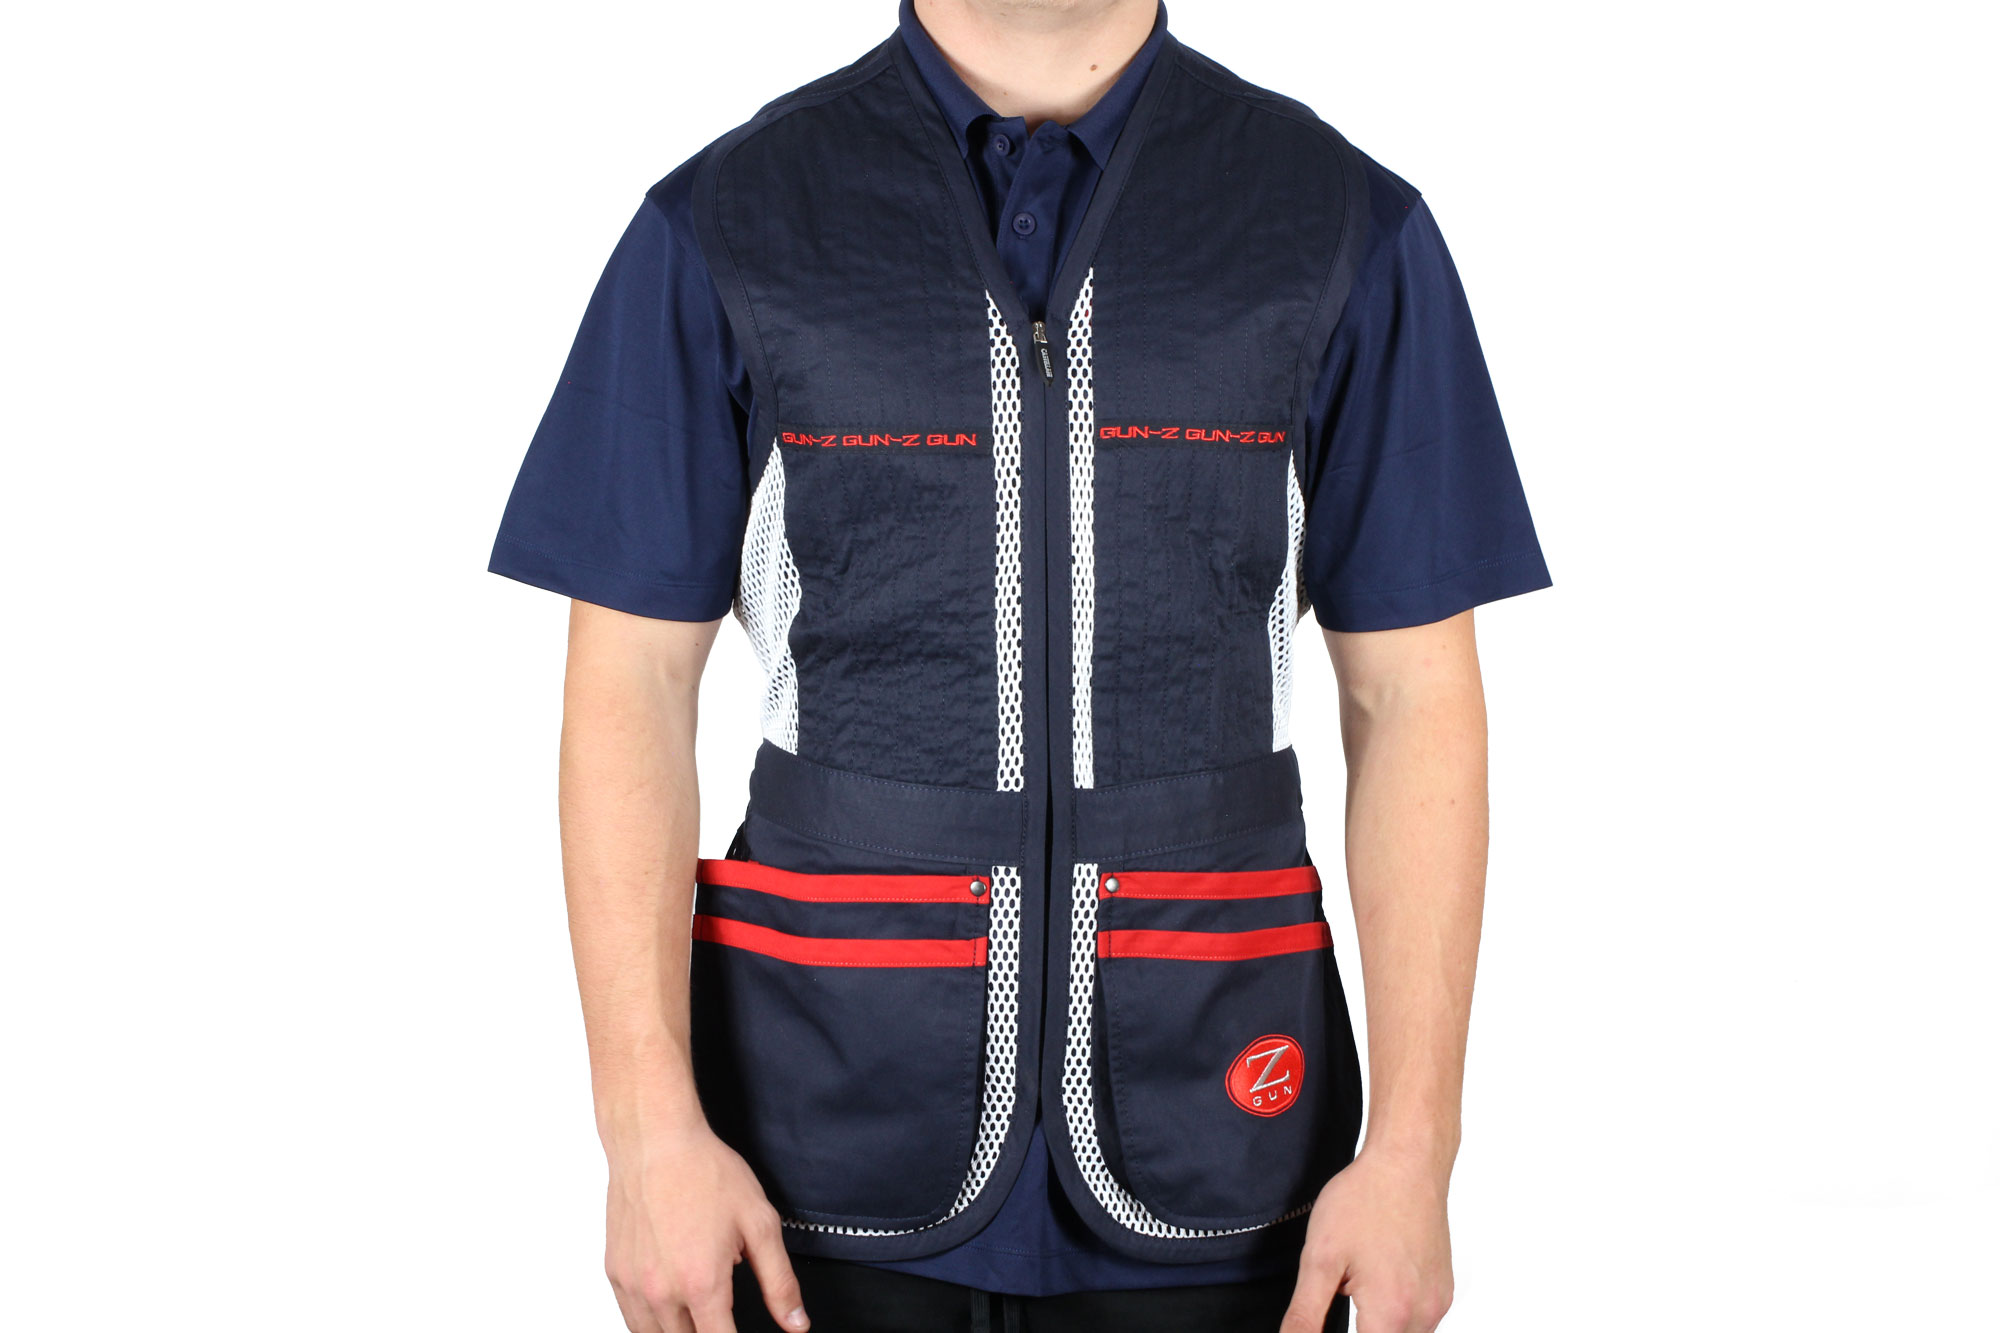 Zoli Shooters Vest By Castellani